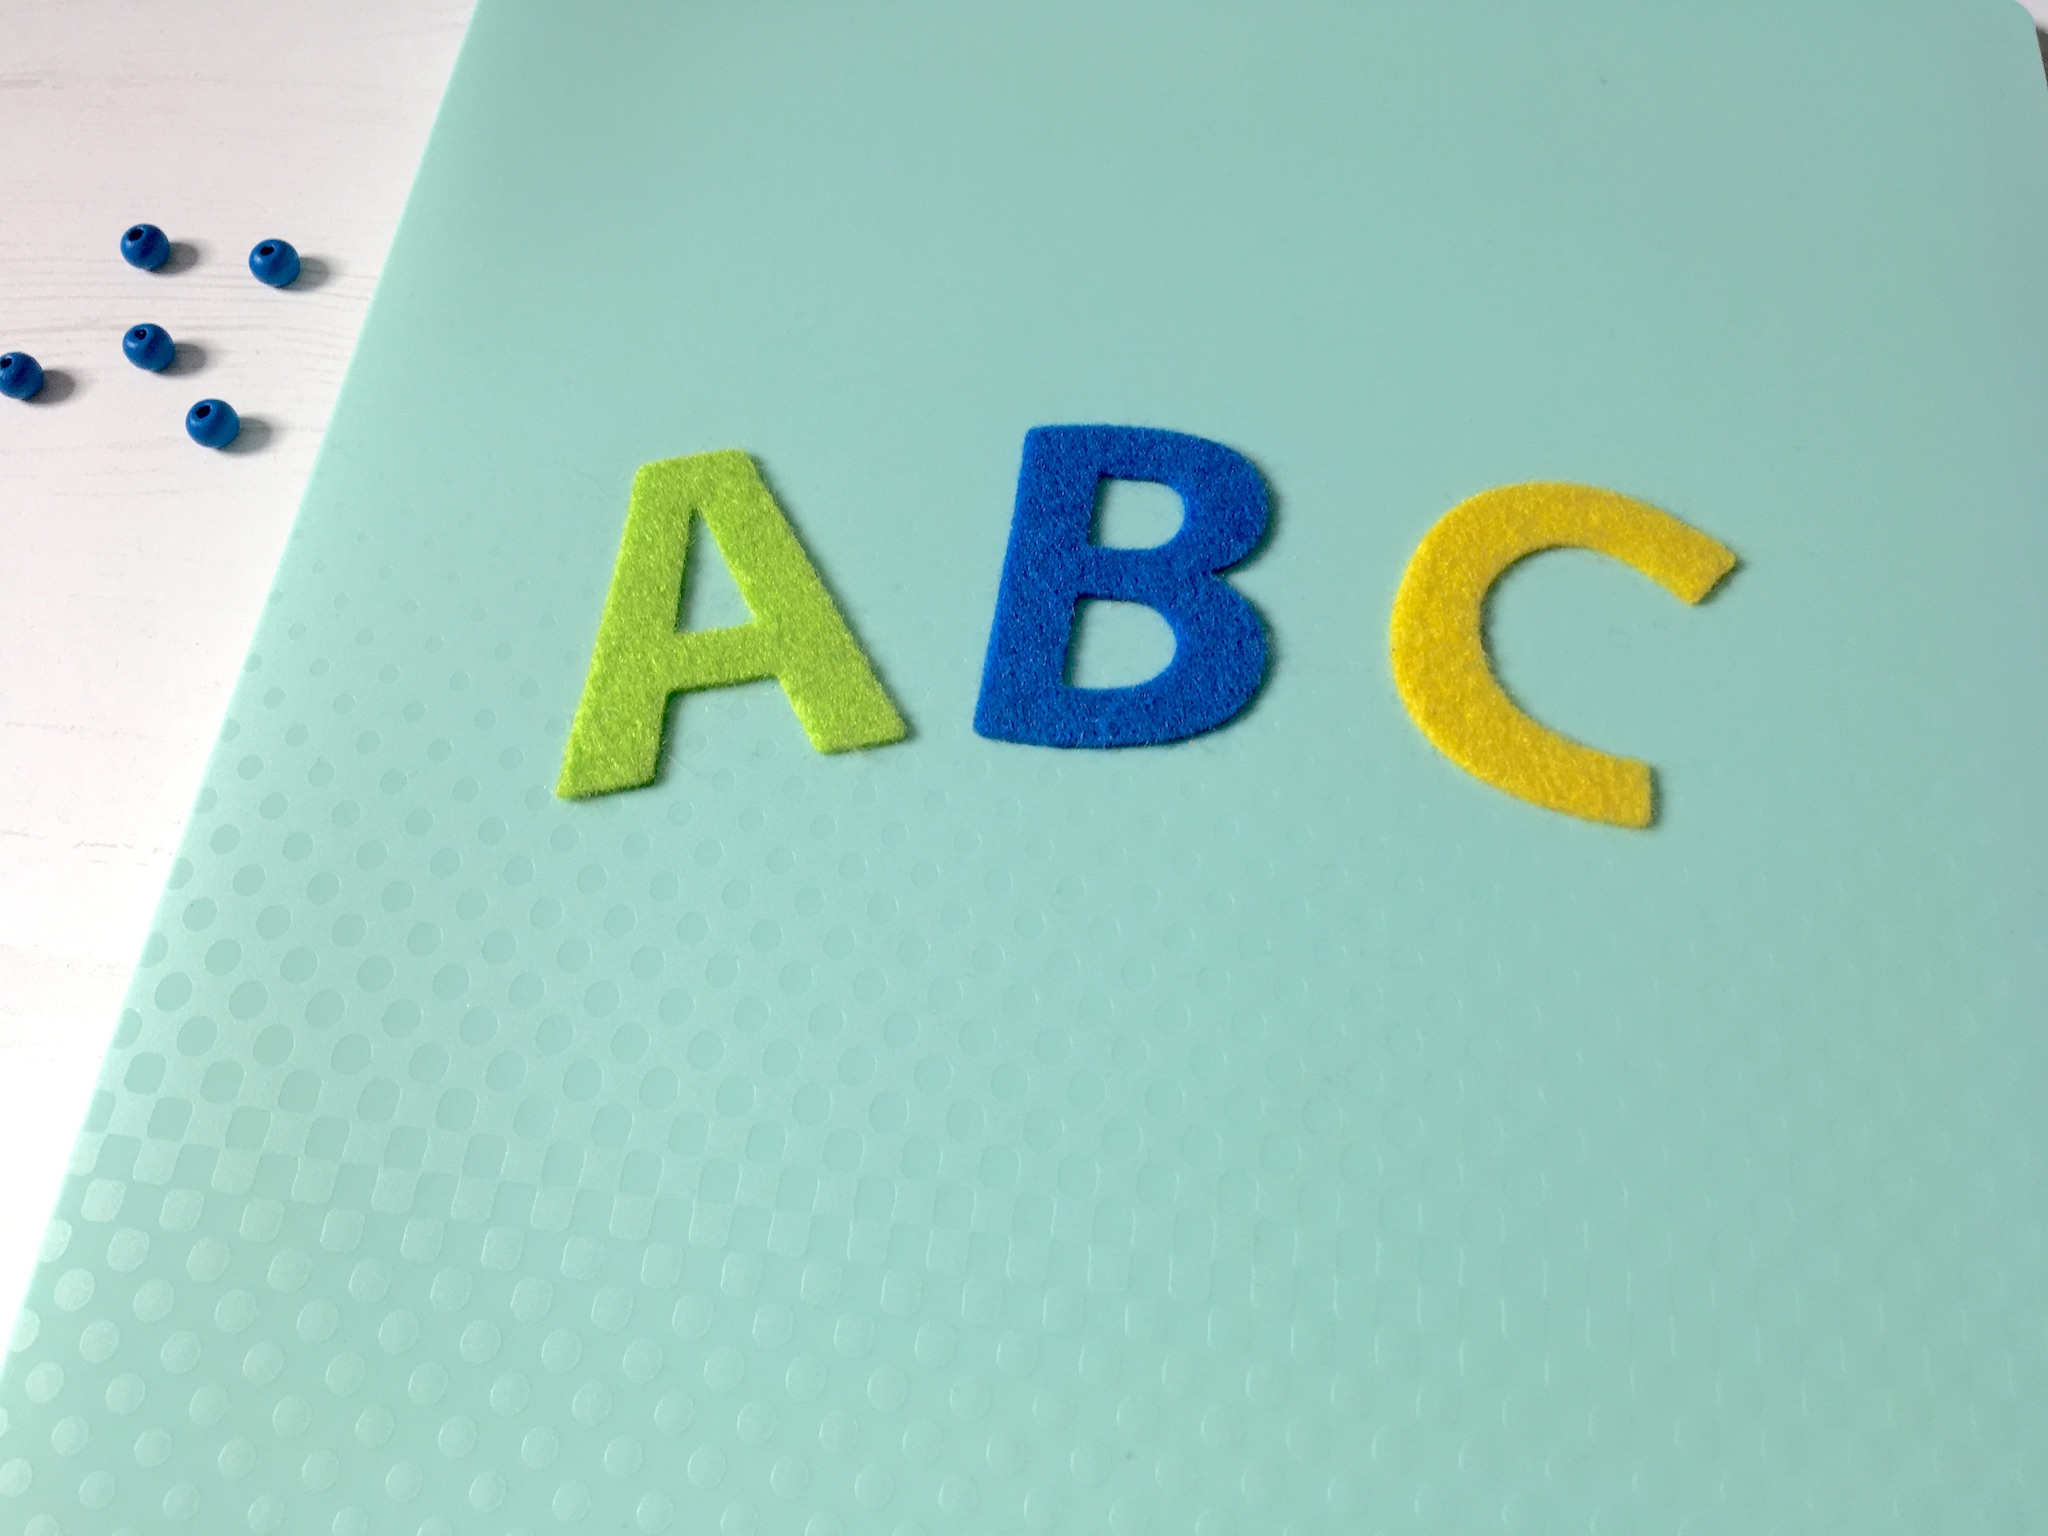 200901-ABC-Buch-05